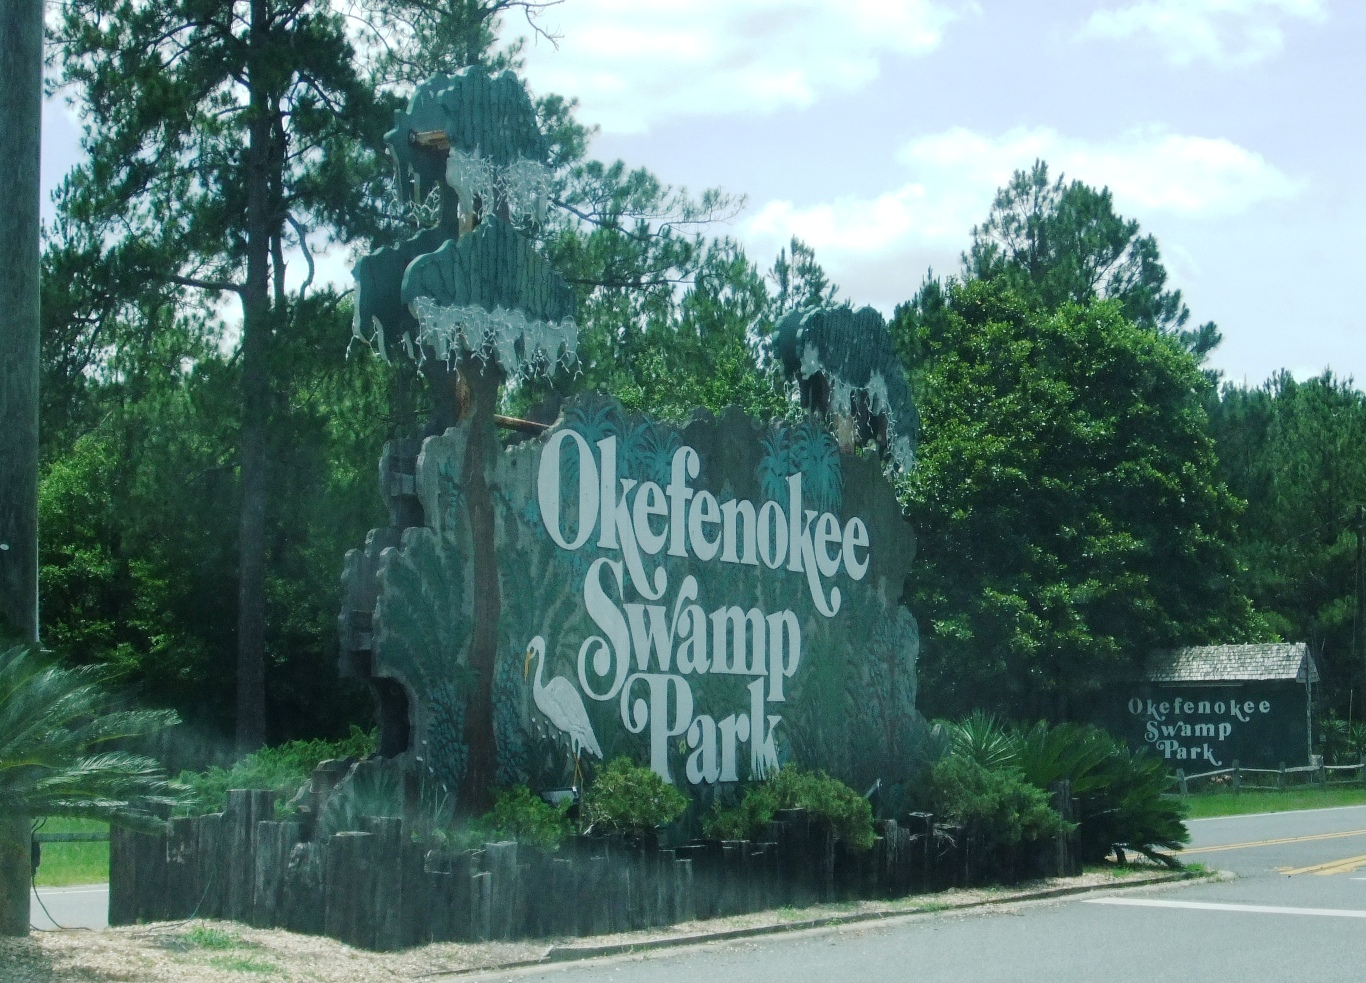 Okefenokee Swamp Park TanksPanky: FTJ...